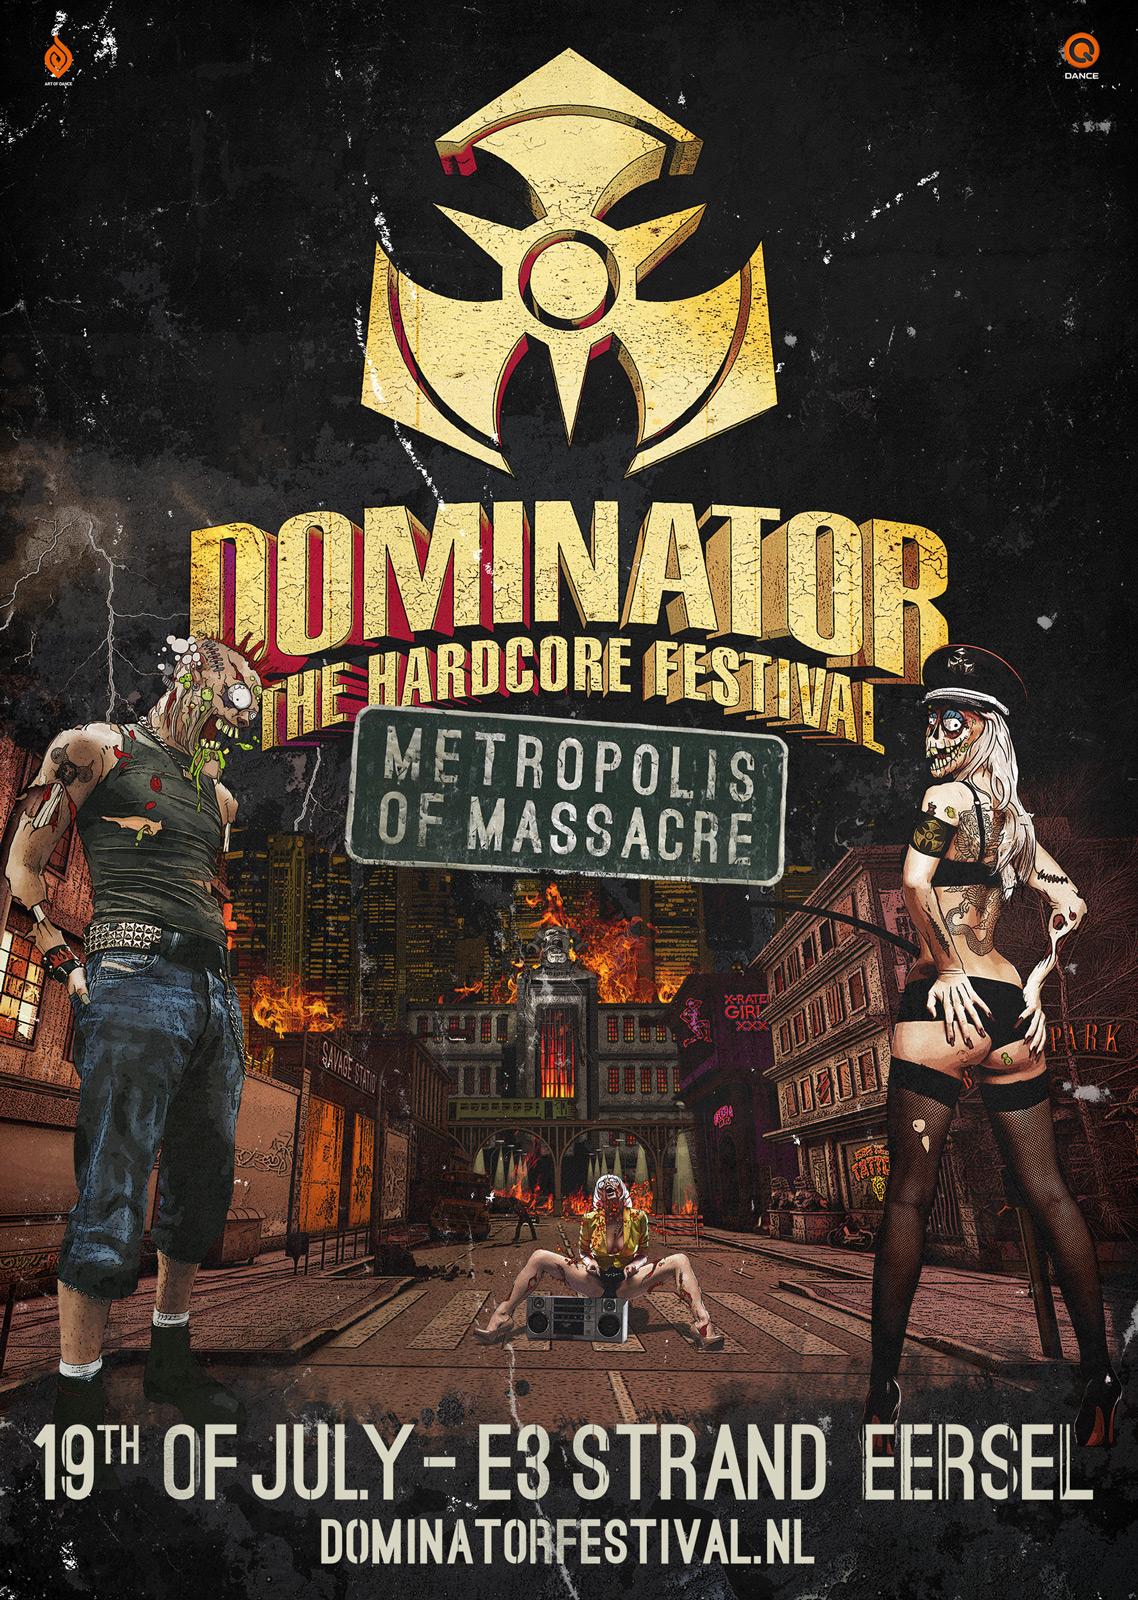 cyberfactory 2014 dominator hardcore festival e3 strand eersel nederland